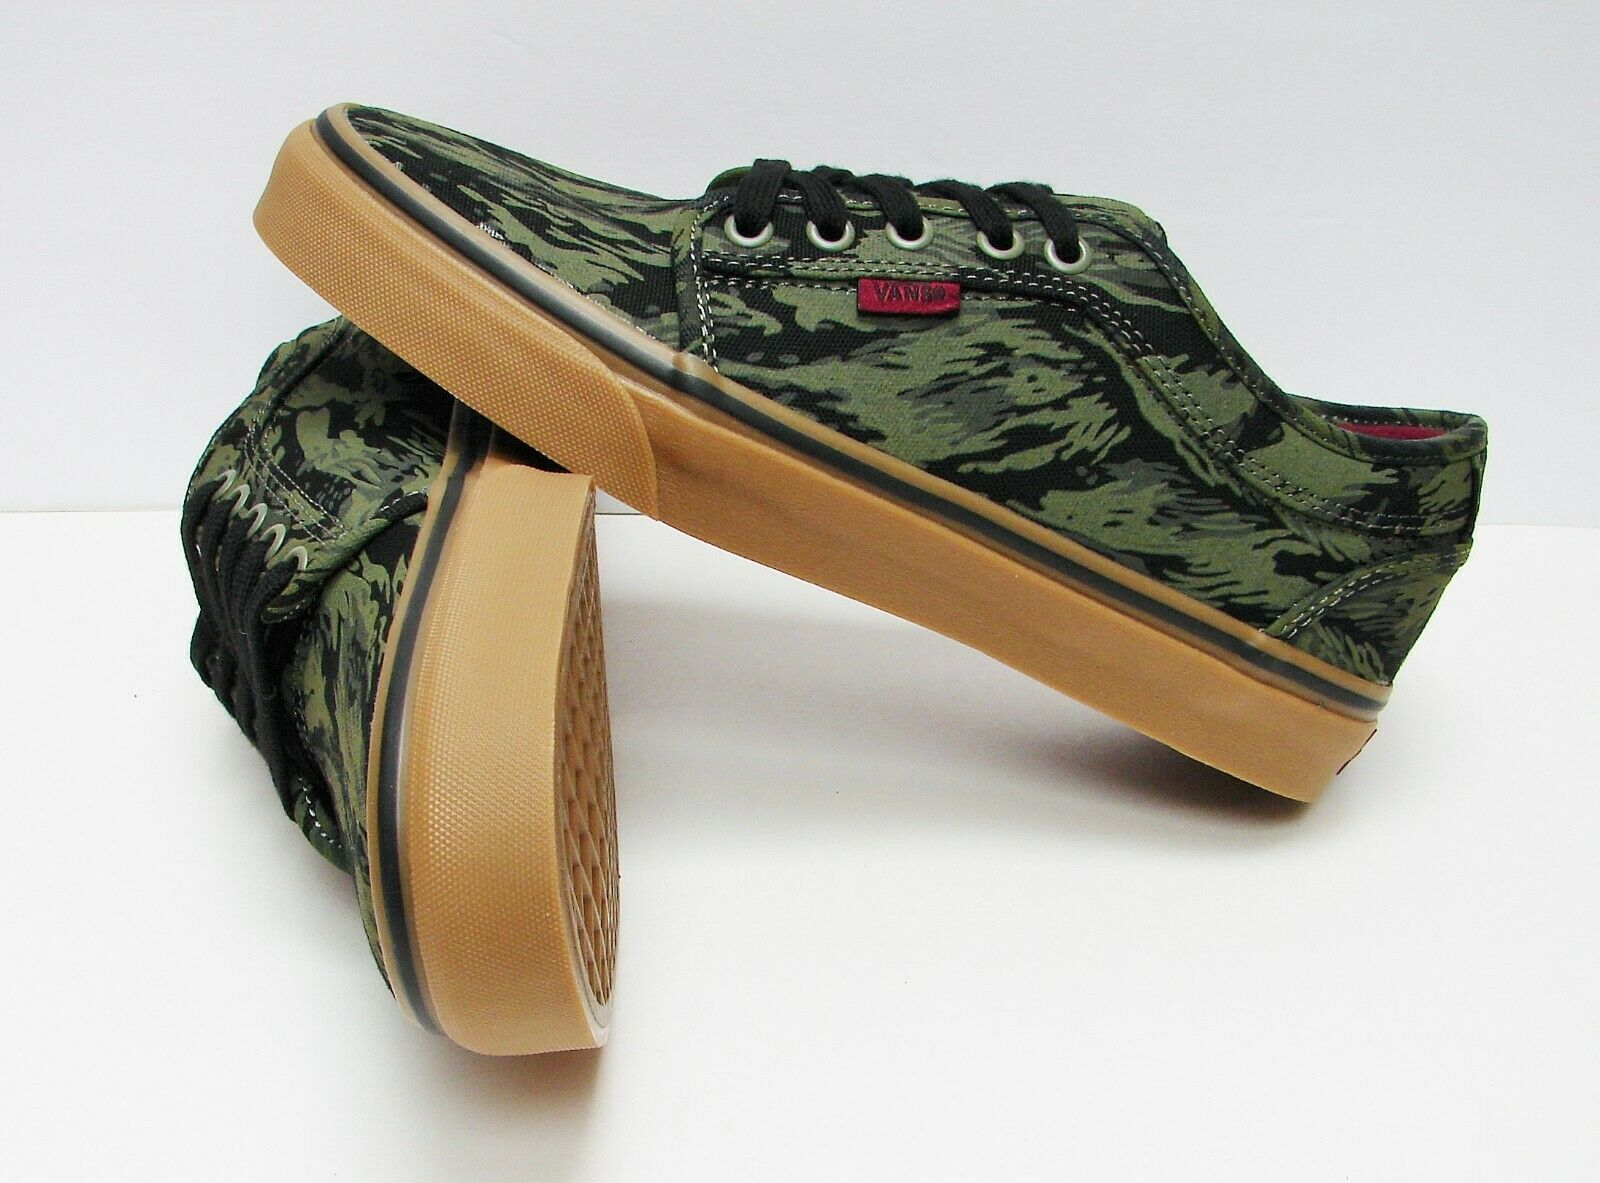 VANS Chukka Low Jungle Camo  Gum VN-000U0GDR1 Men's size  10.5